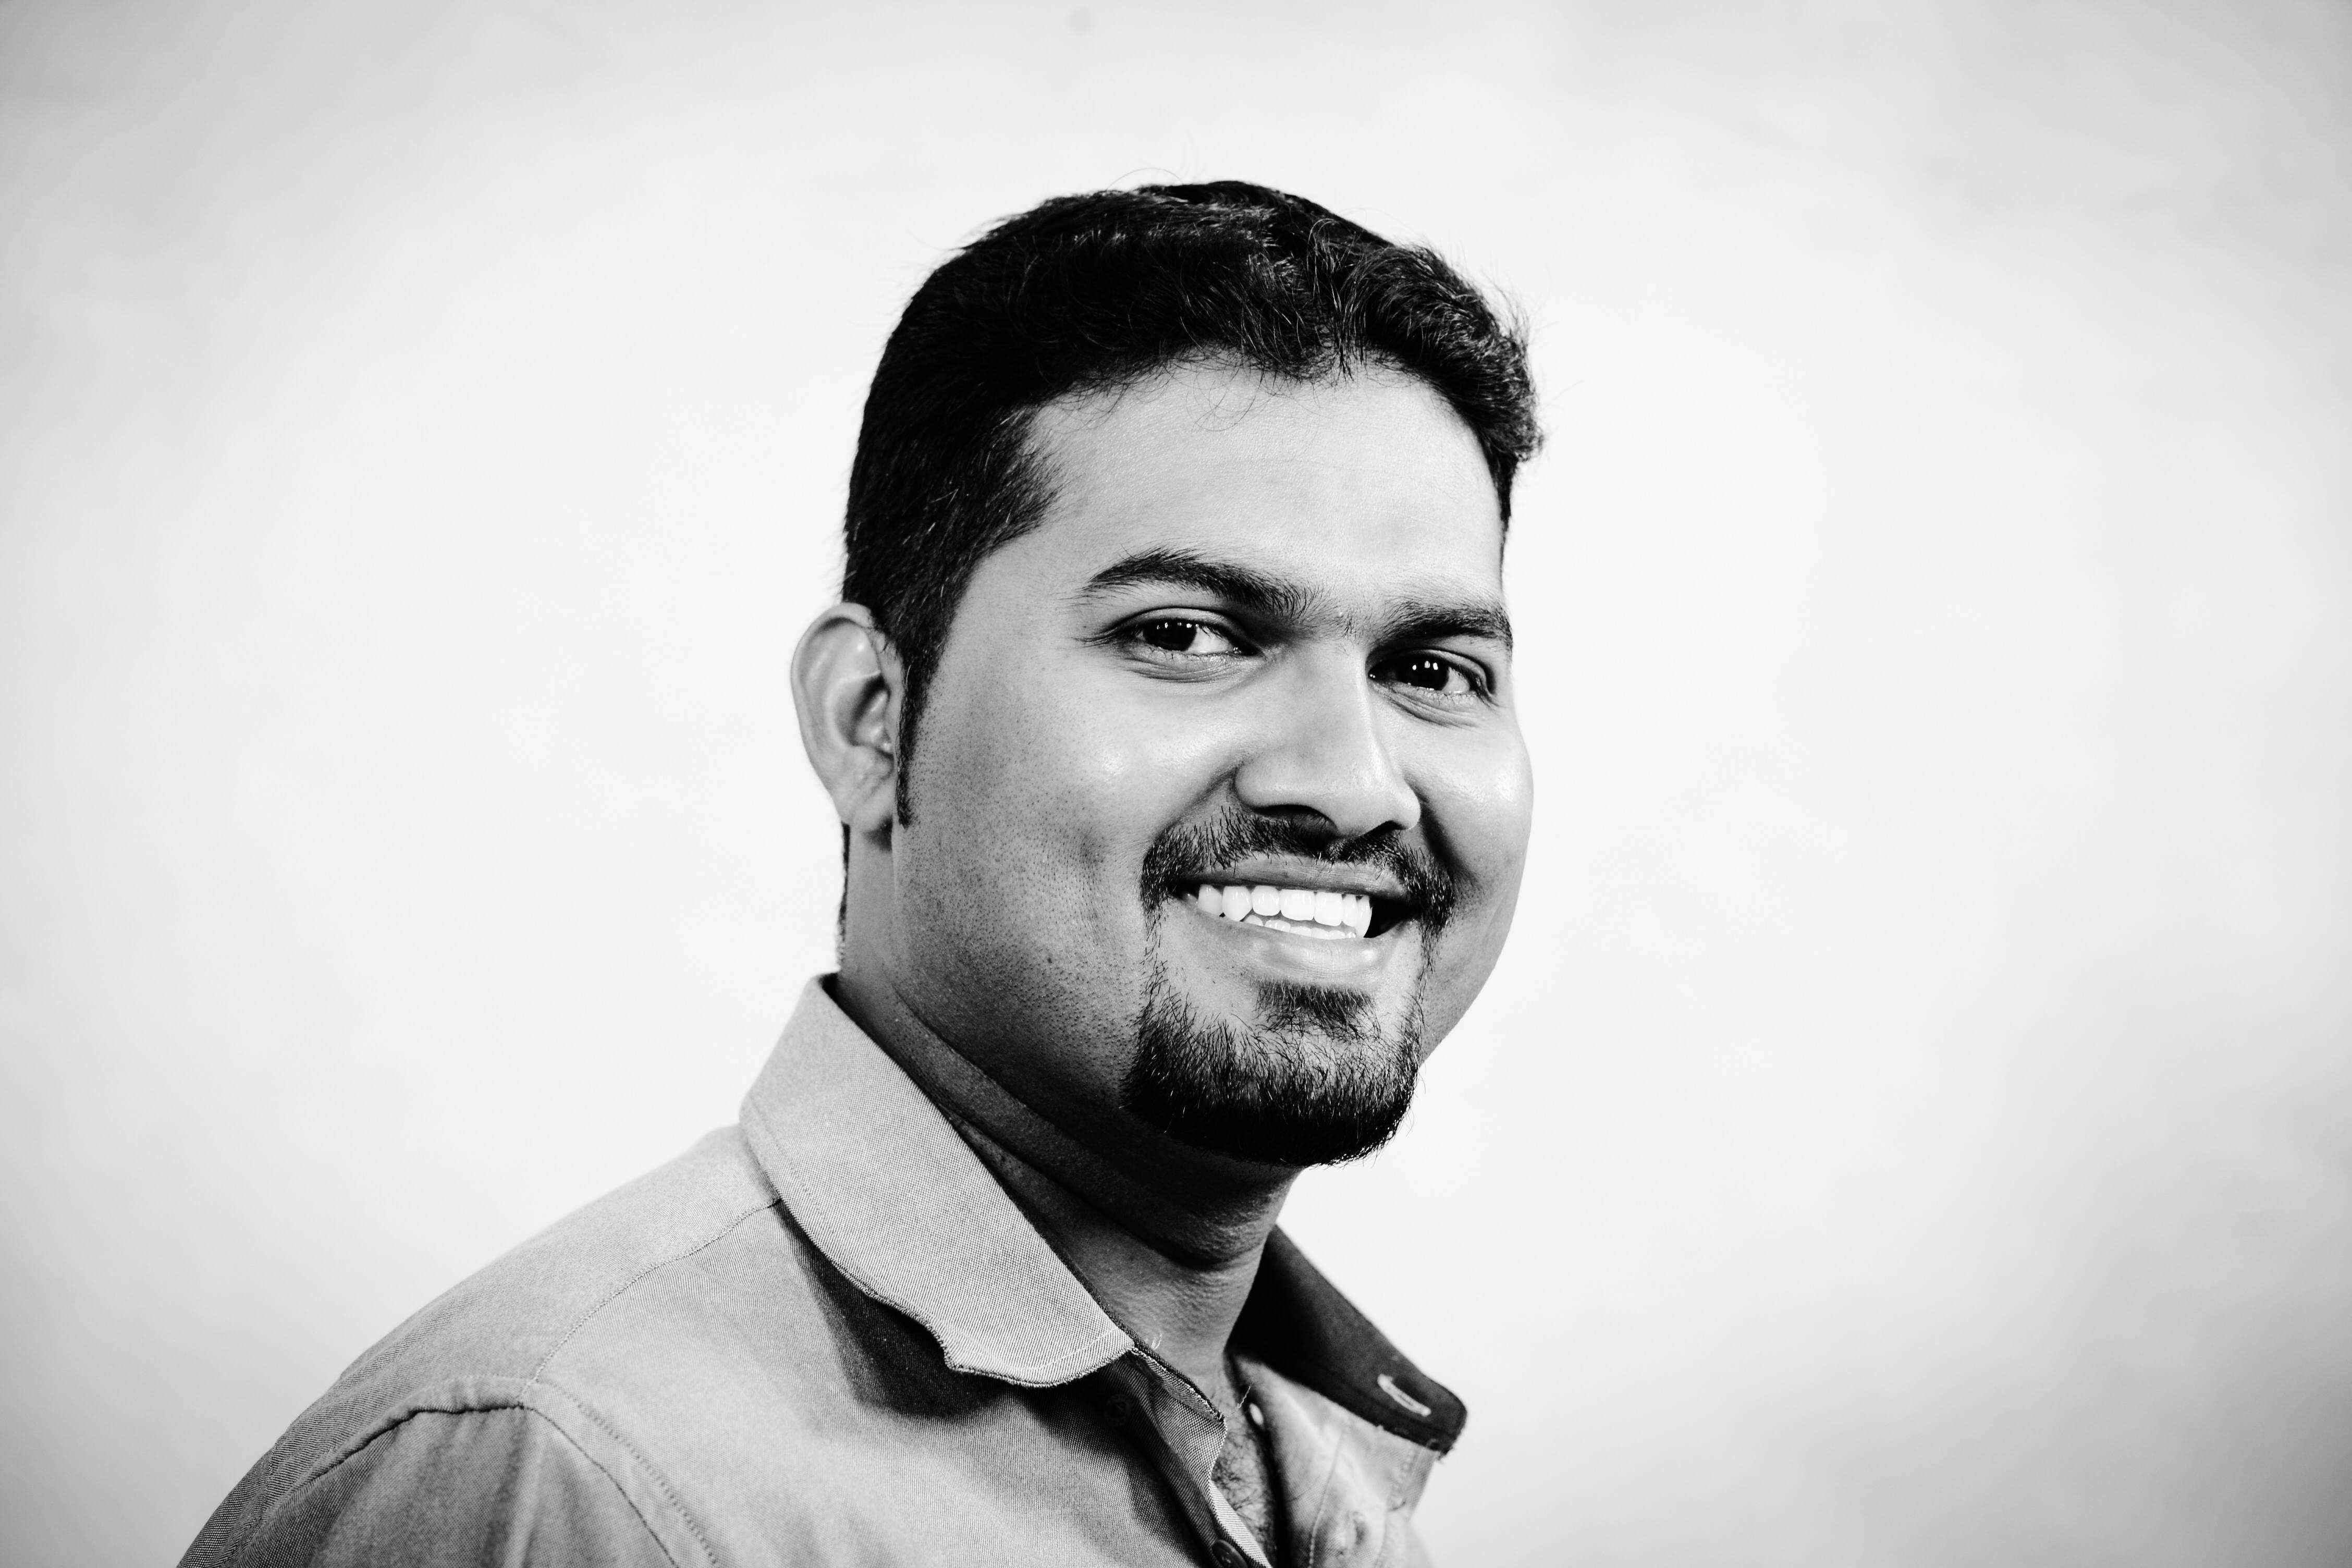 Prem Kumar @ PK